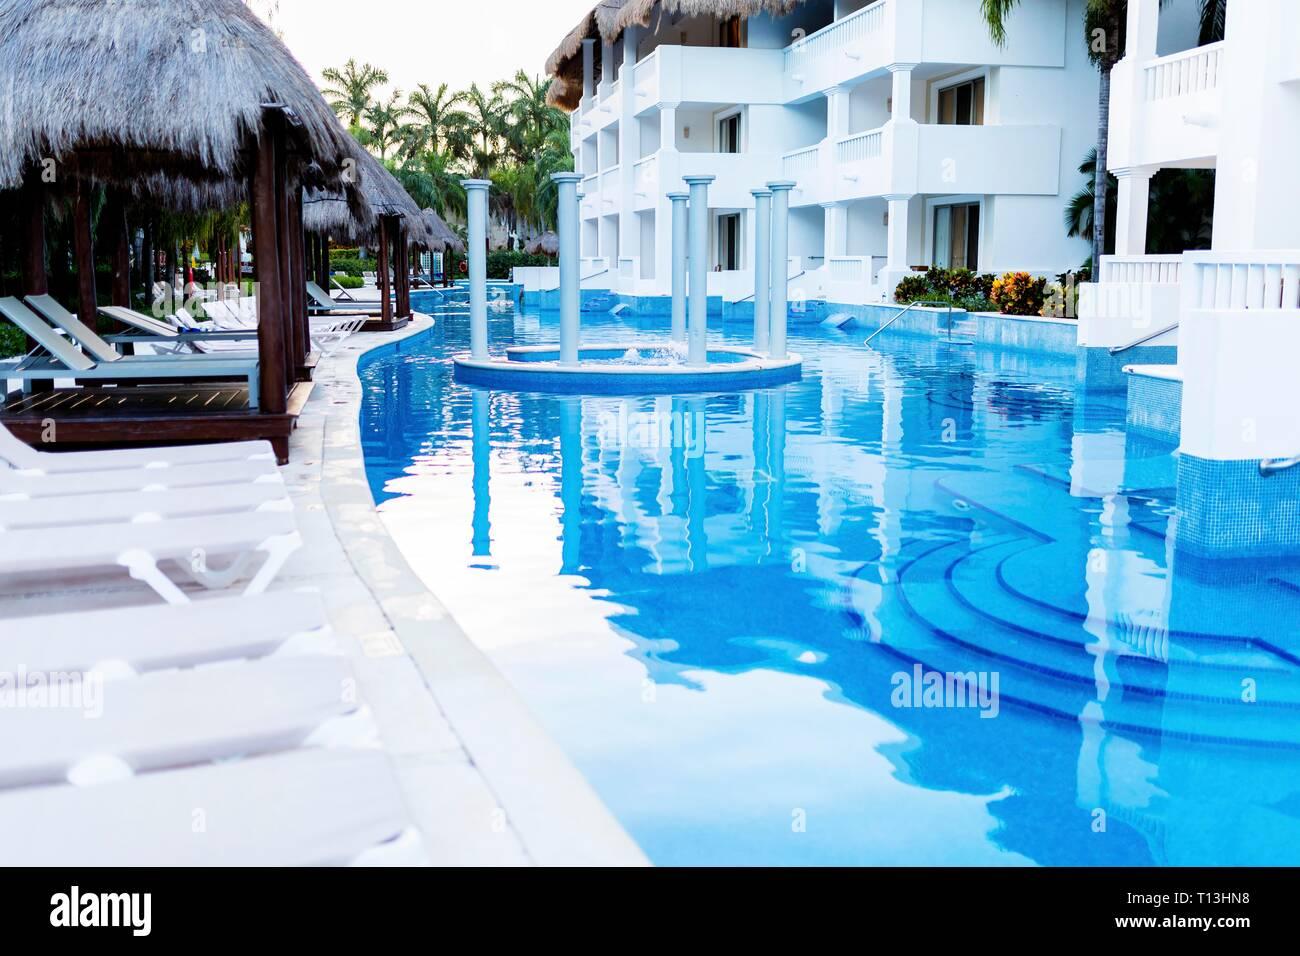 Grand Riviera Princess Hotel In Mexico Riviera Maya On 24th